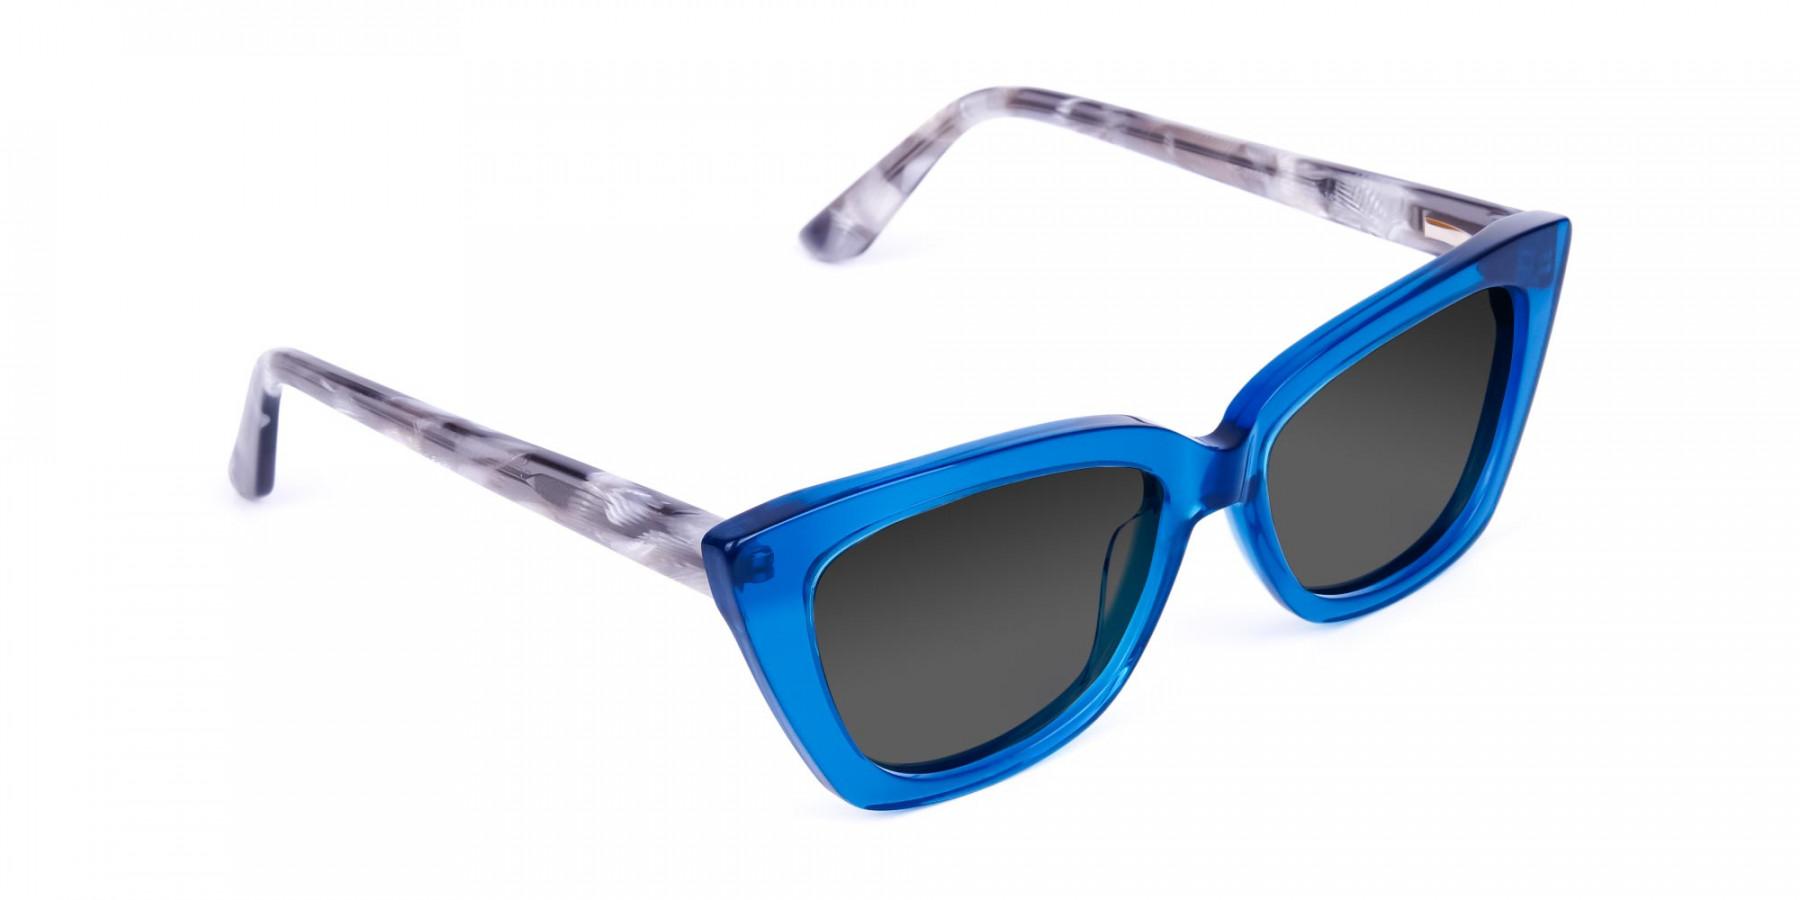 Blue-Cat-Eye-Sunglasses-with-Grey-Tint-3